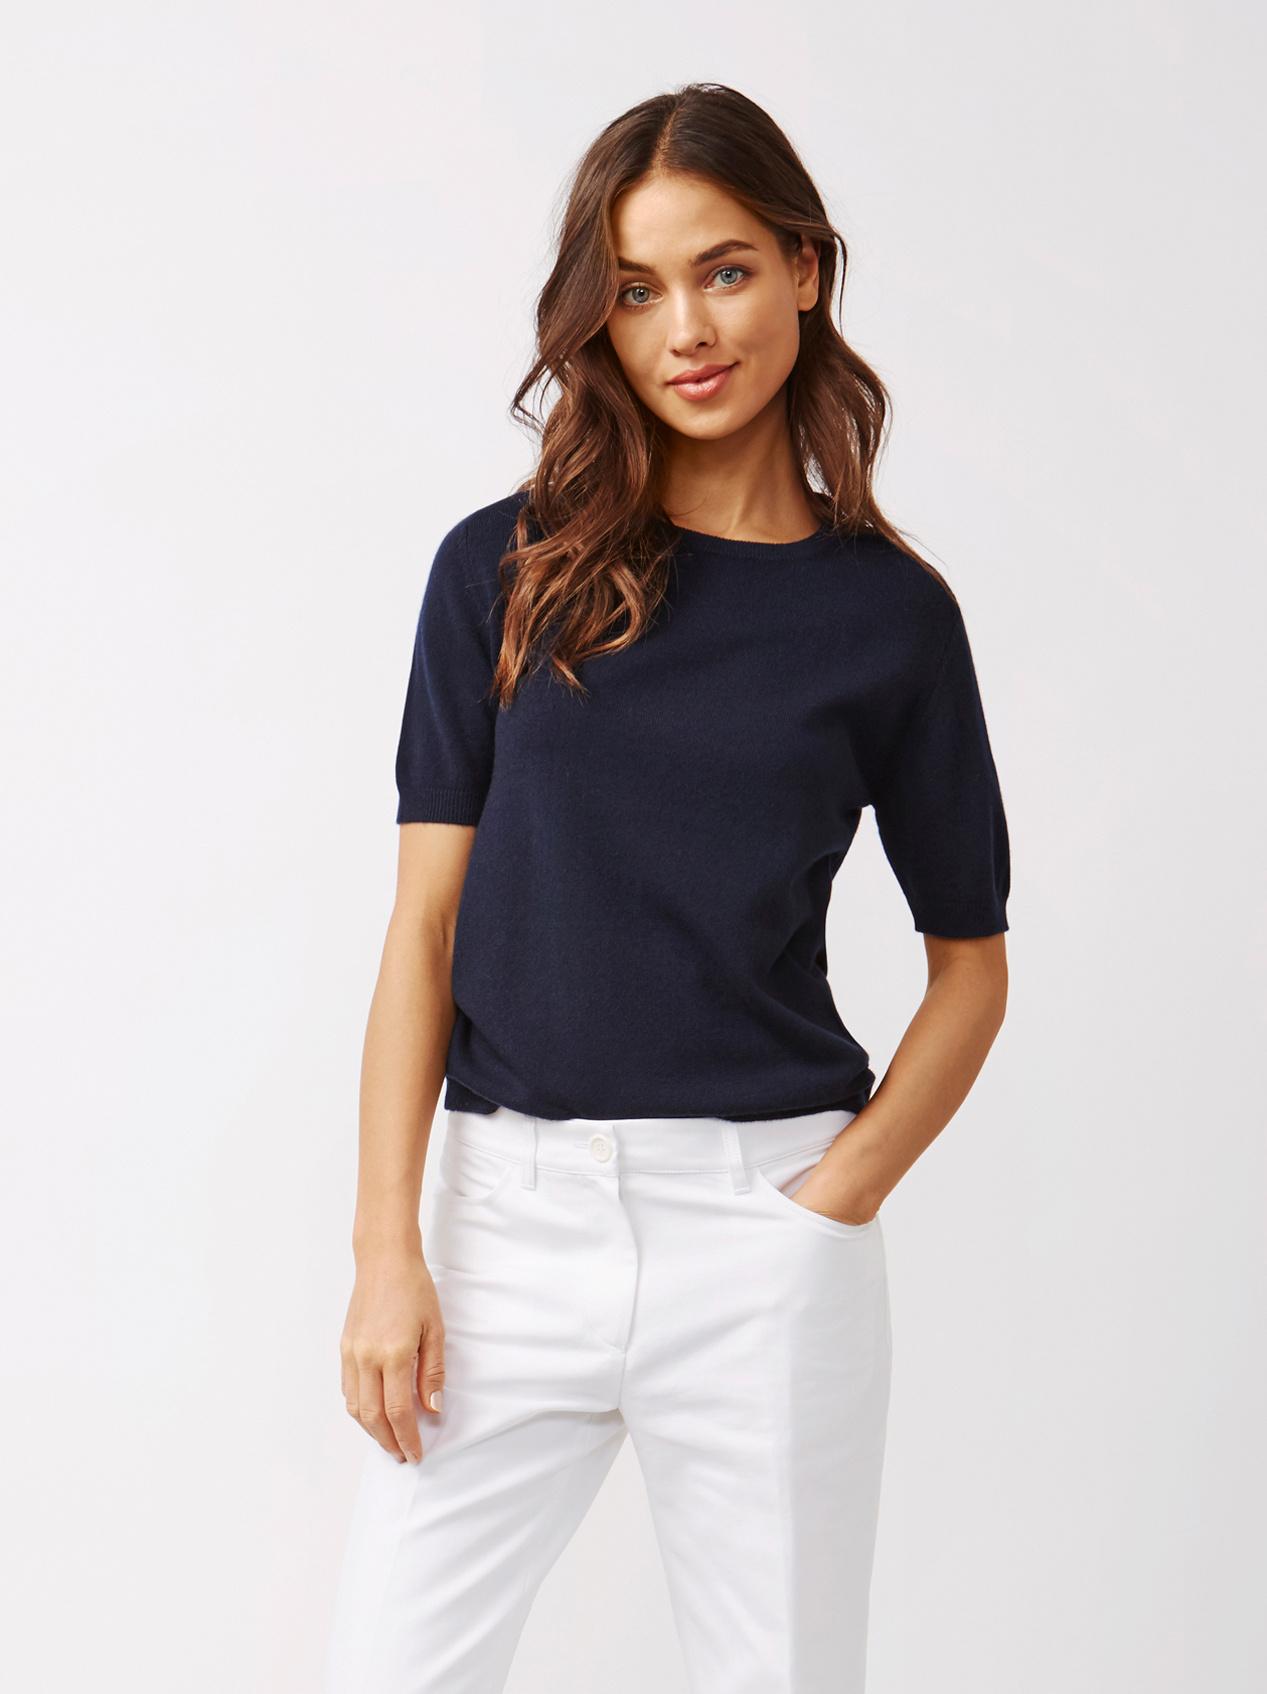 Soft Goat Women's Short Sleeve O-Neck Navy